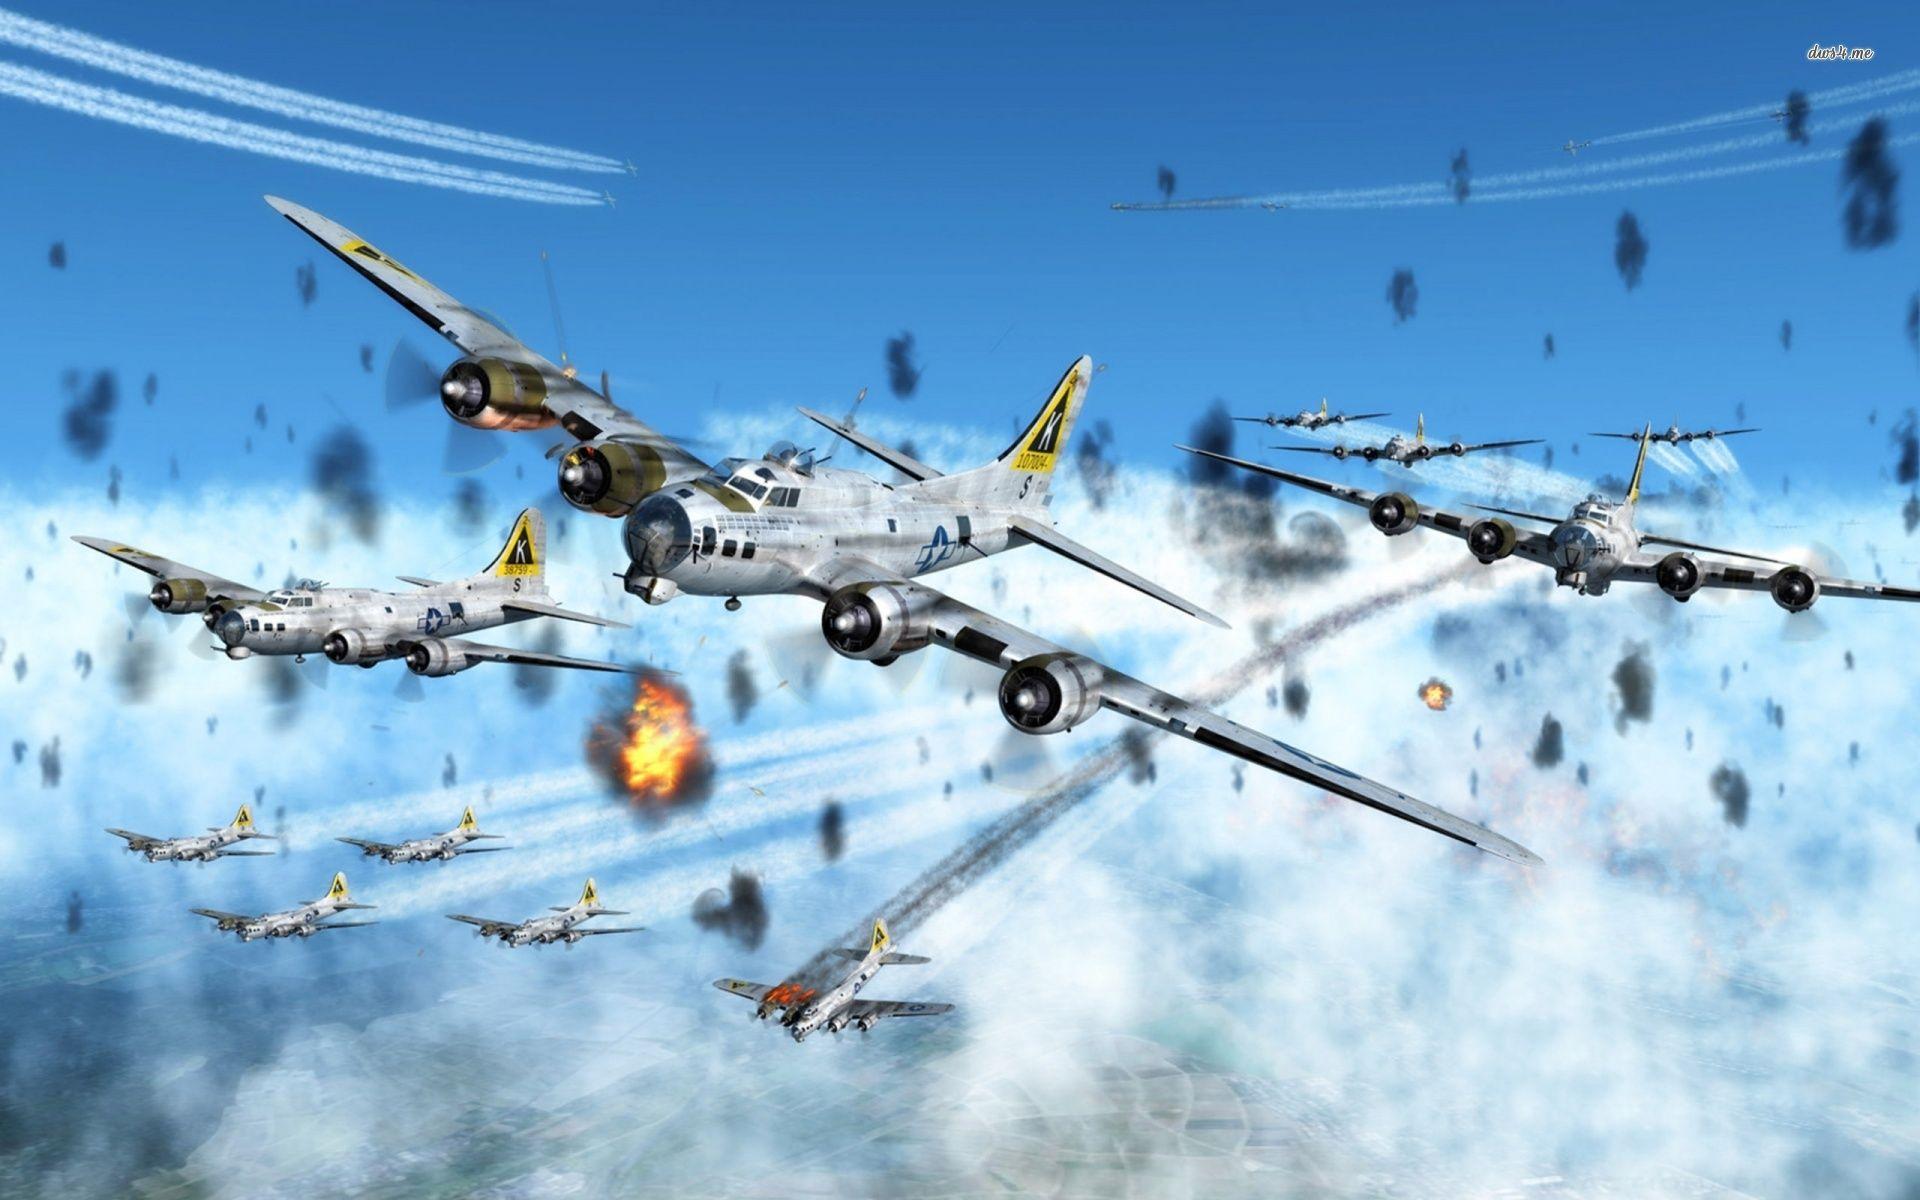 Boeing B 17 Flying Fortress Hd Wallpaper Aircraft Design Aircraft